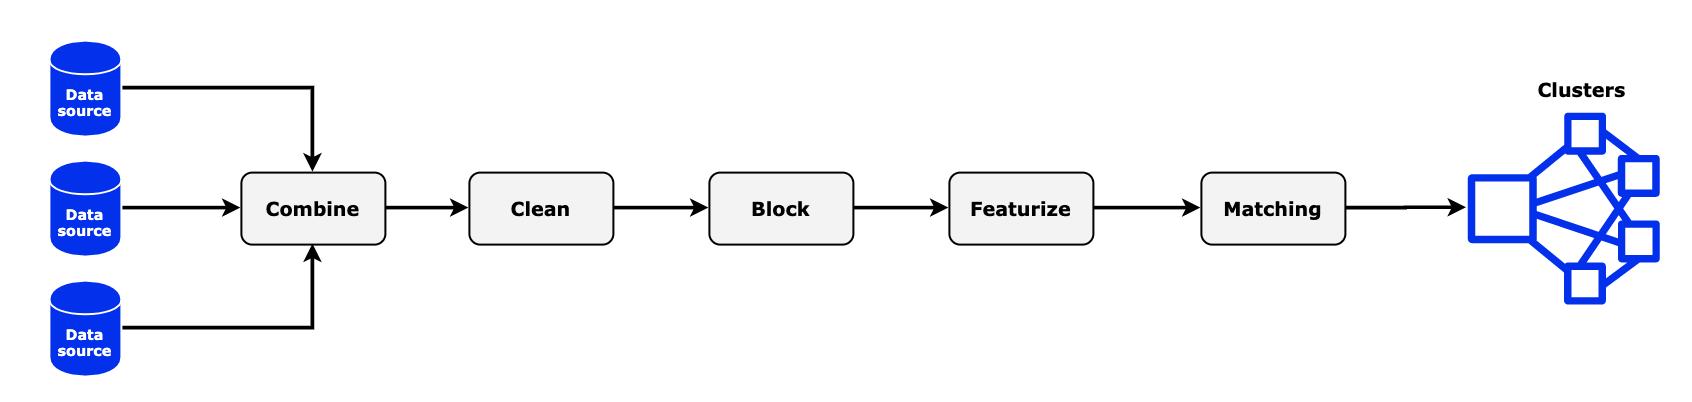 Entity Resolution Steps